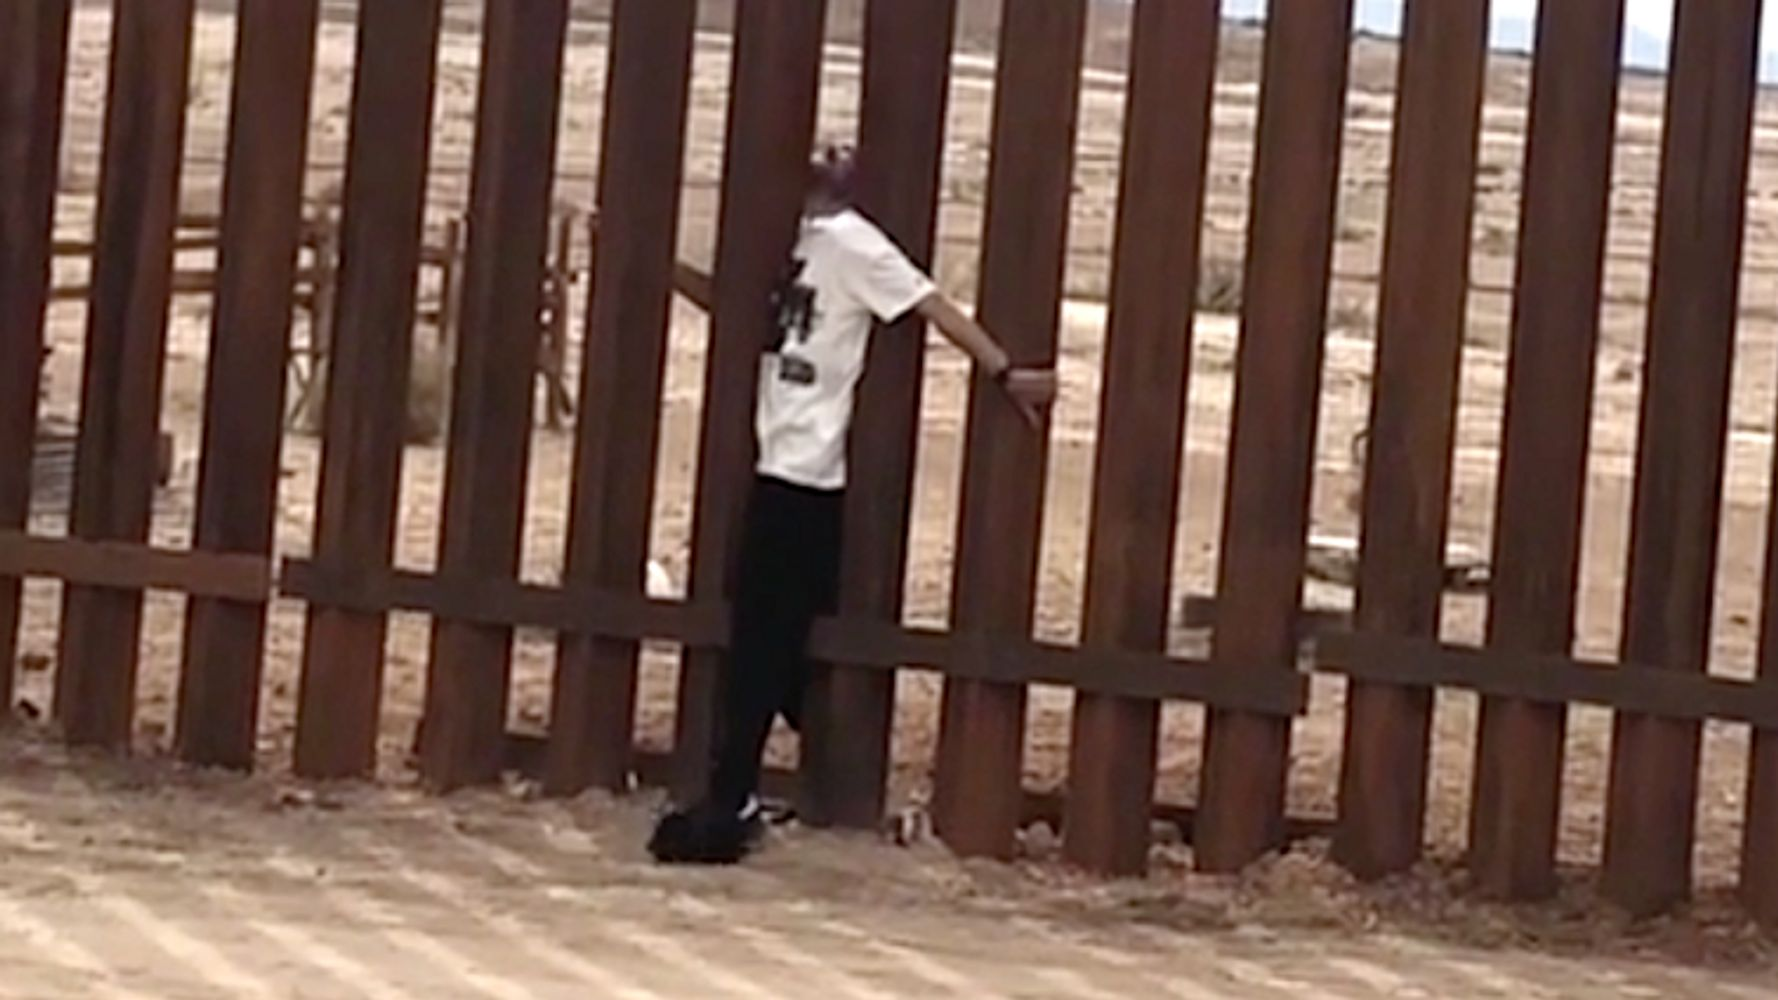 Magician Walks Through U.S.-Mexico Border Wall In 'Riskiest Stunt'